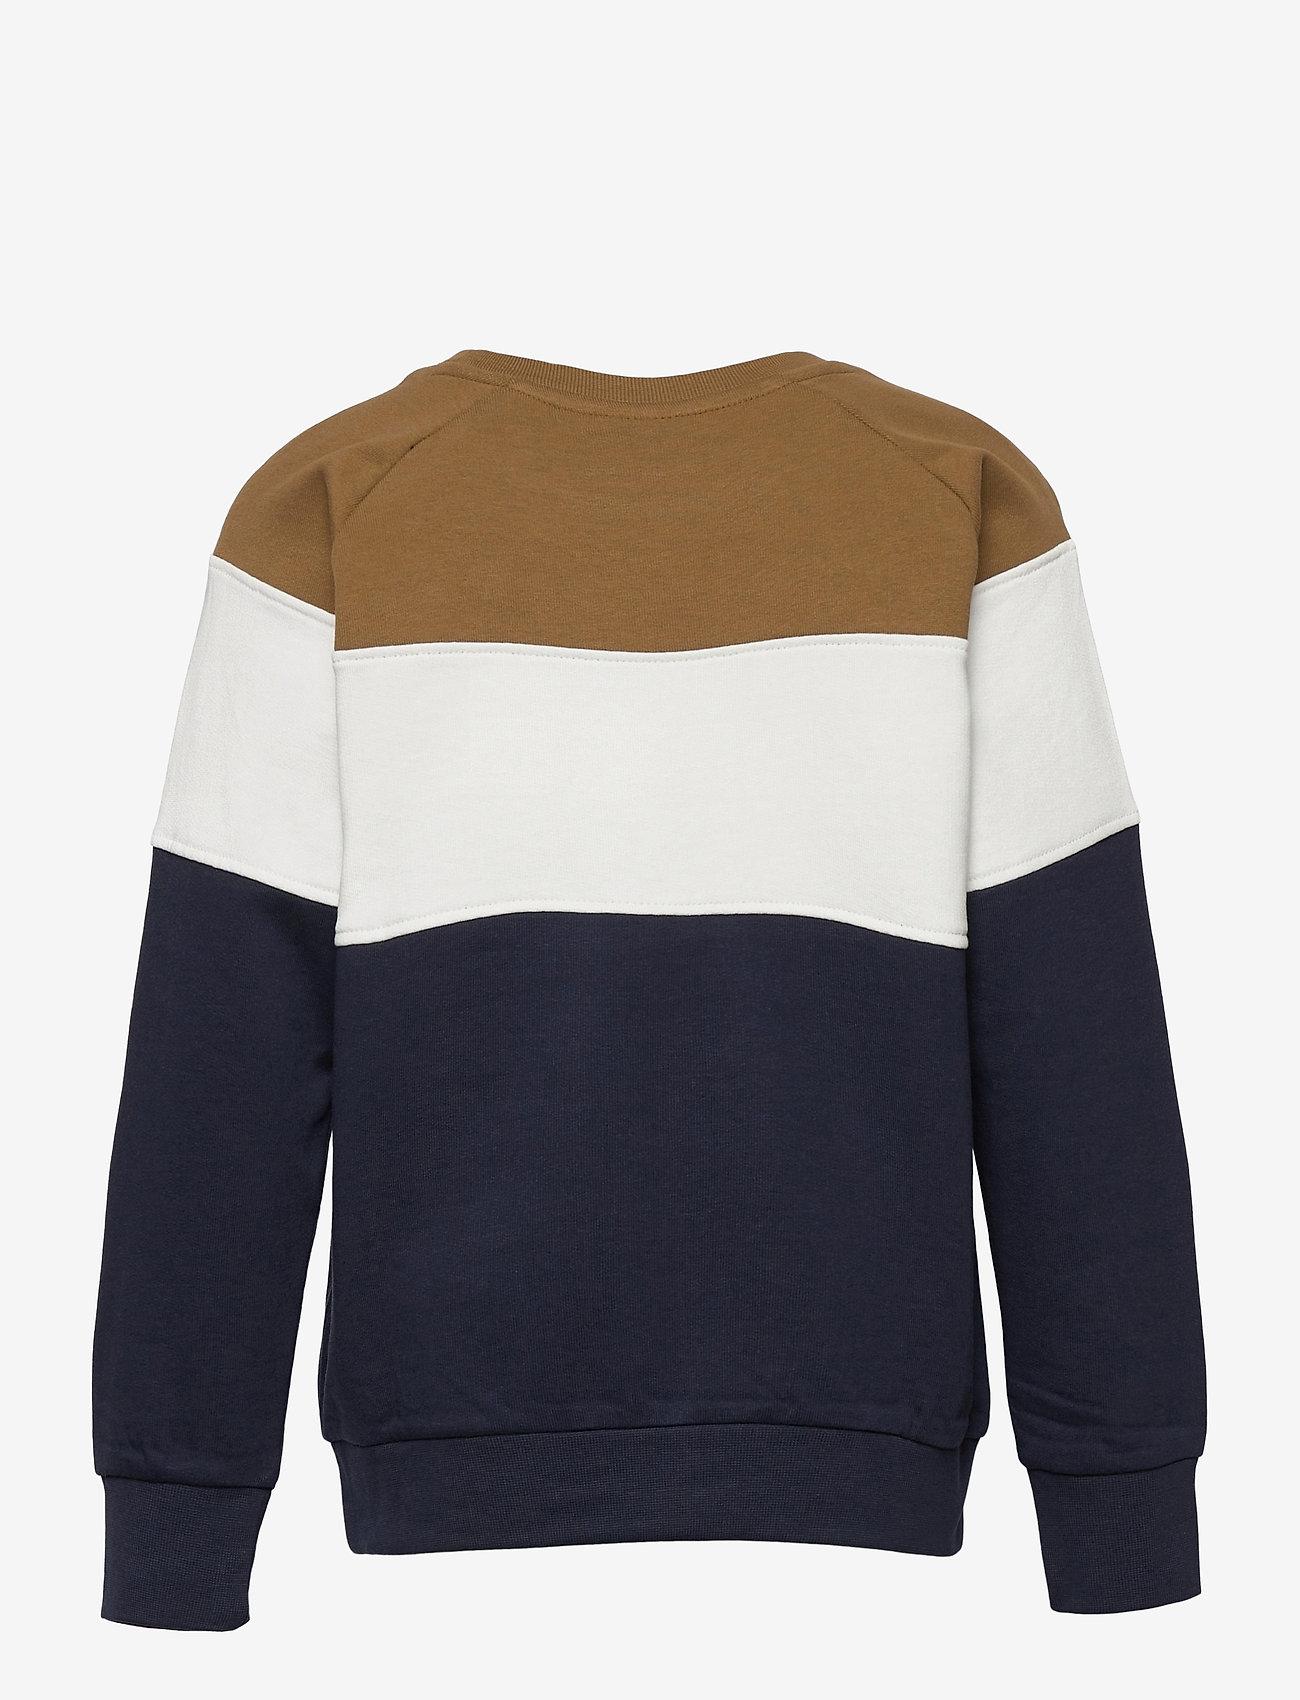 Hummel - hmlCLAES SWEATSHIRT - sweatshirts - rubber - 1